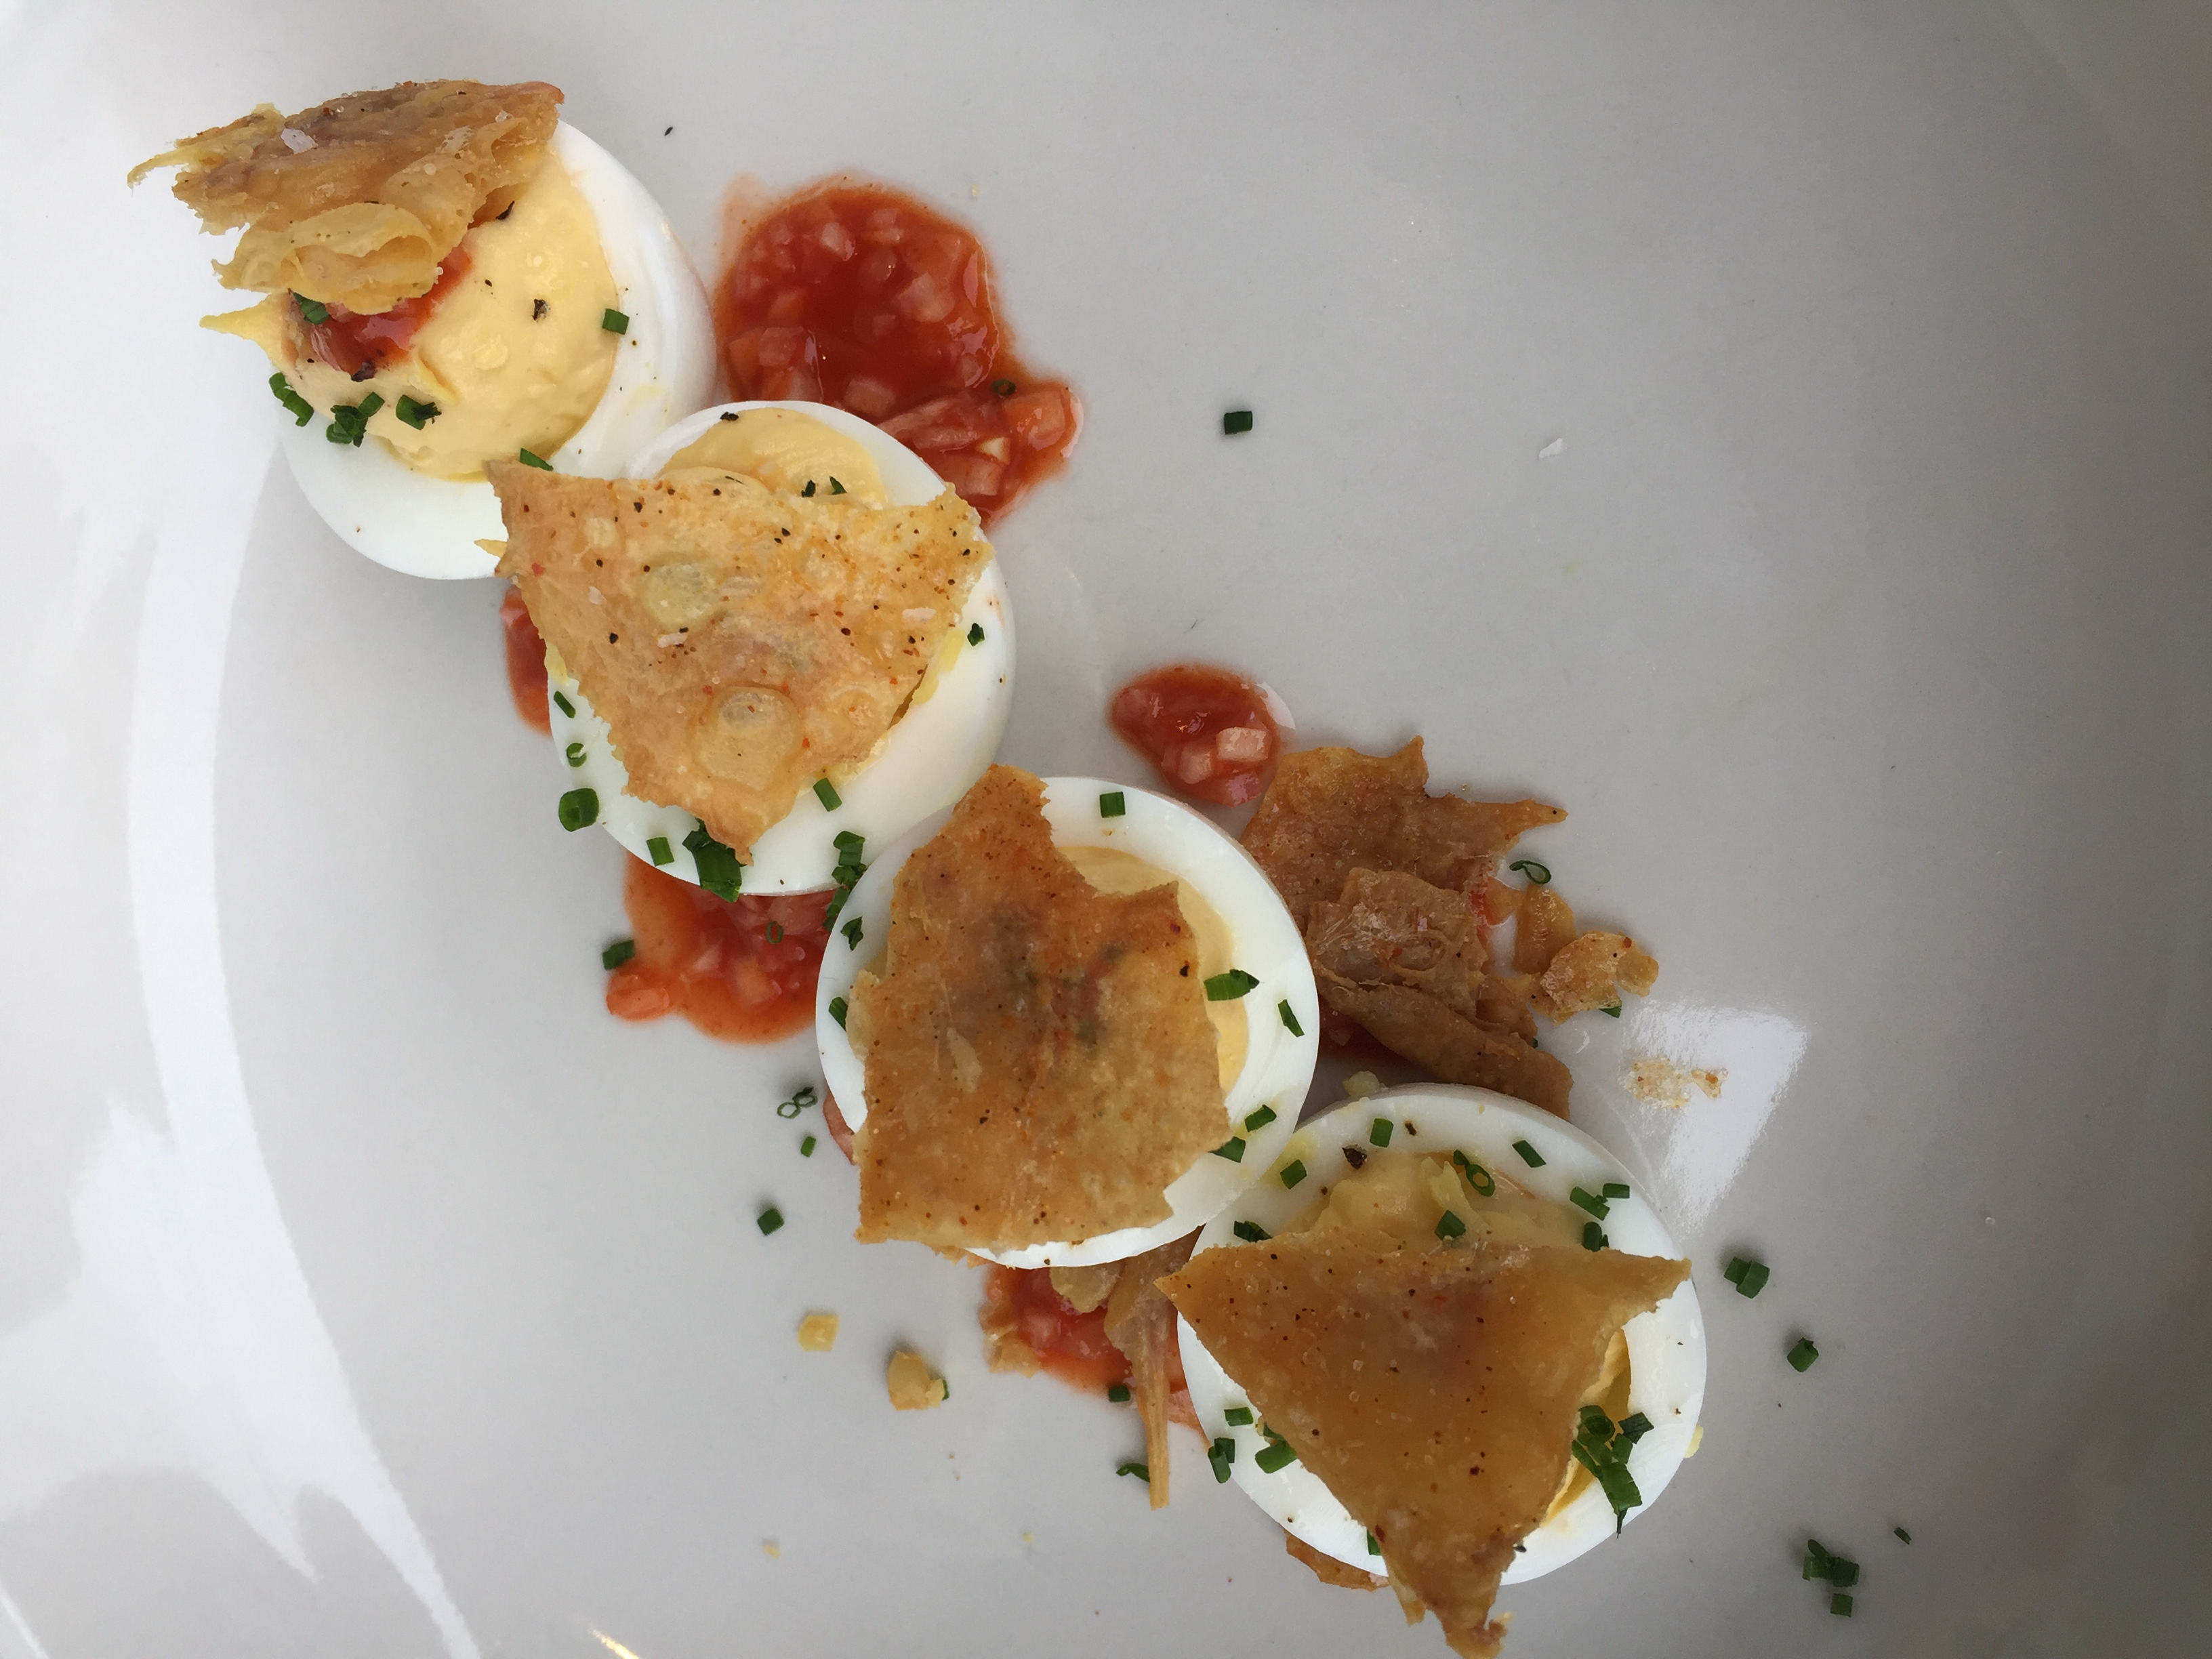 The Cavalier's deviled eggs